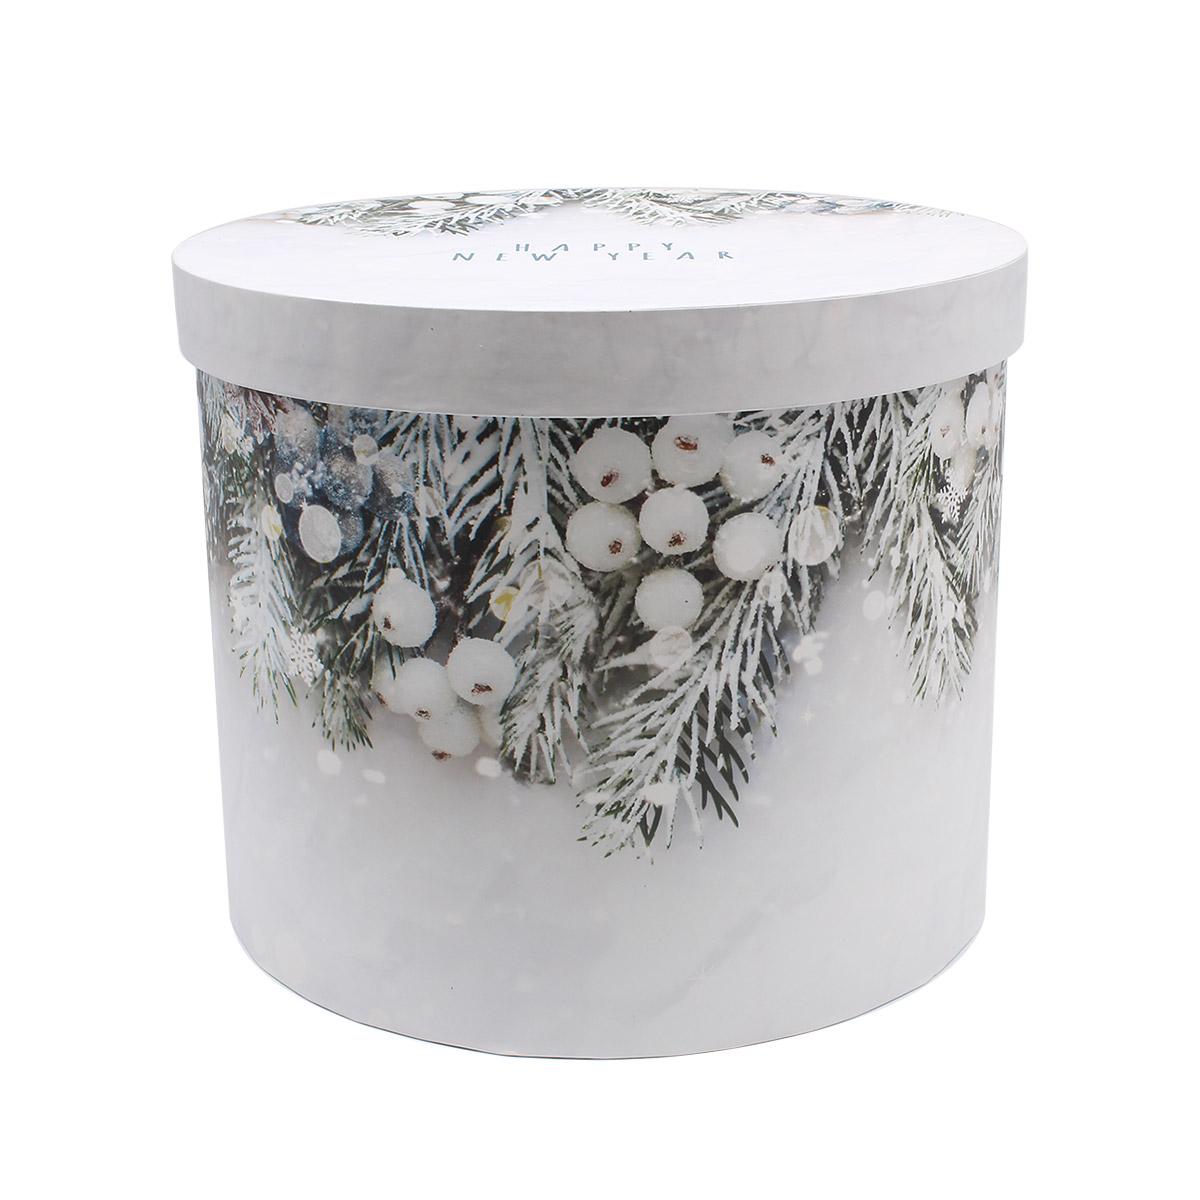 4371617 Круглая подарочная коробка 'Зимняя сказка', 15*18 см